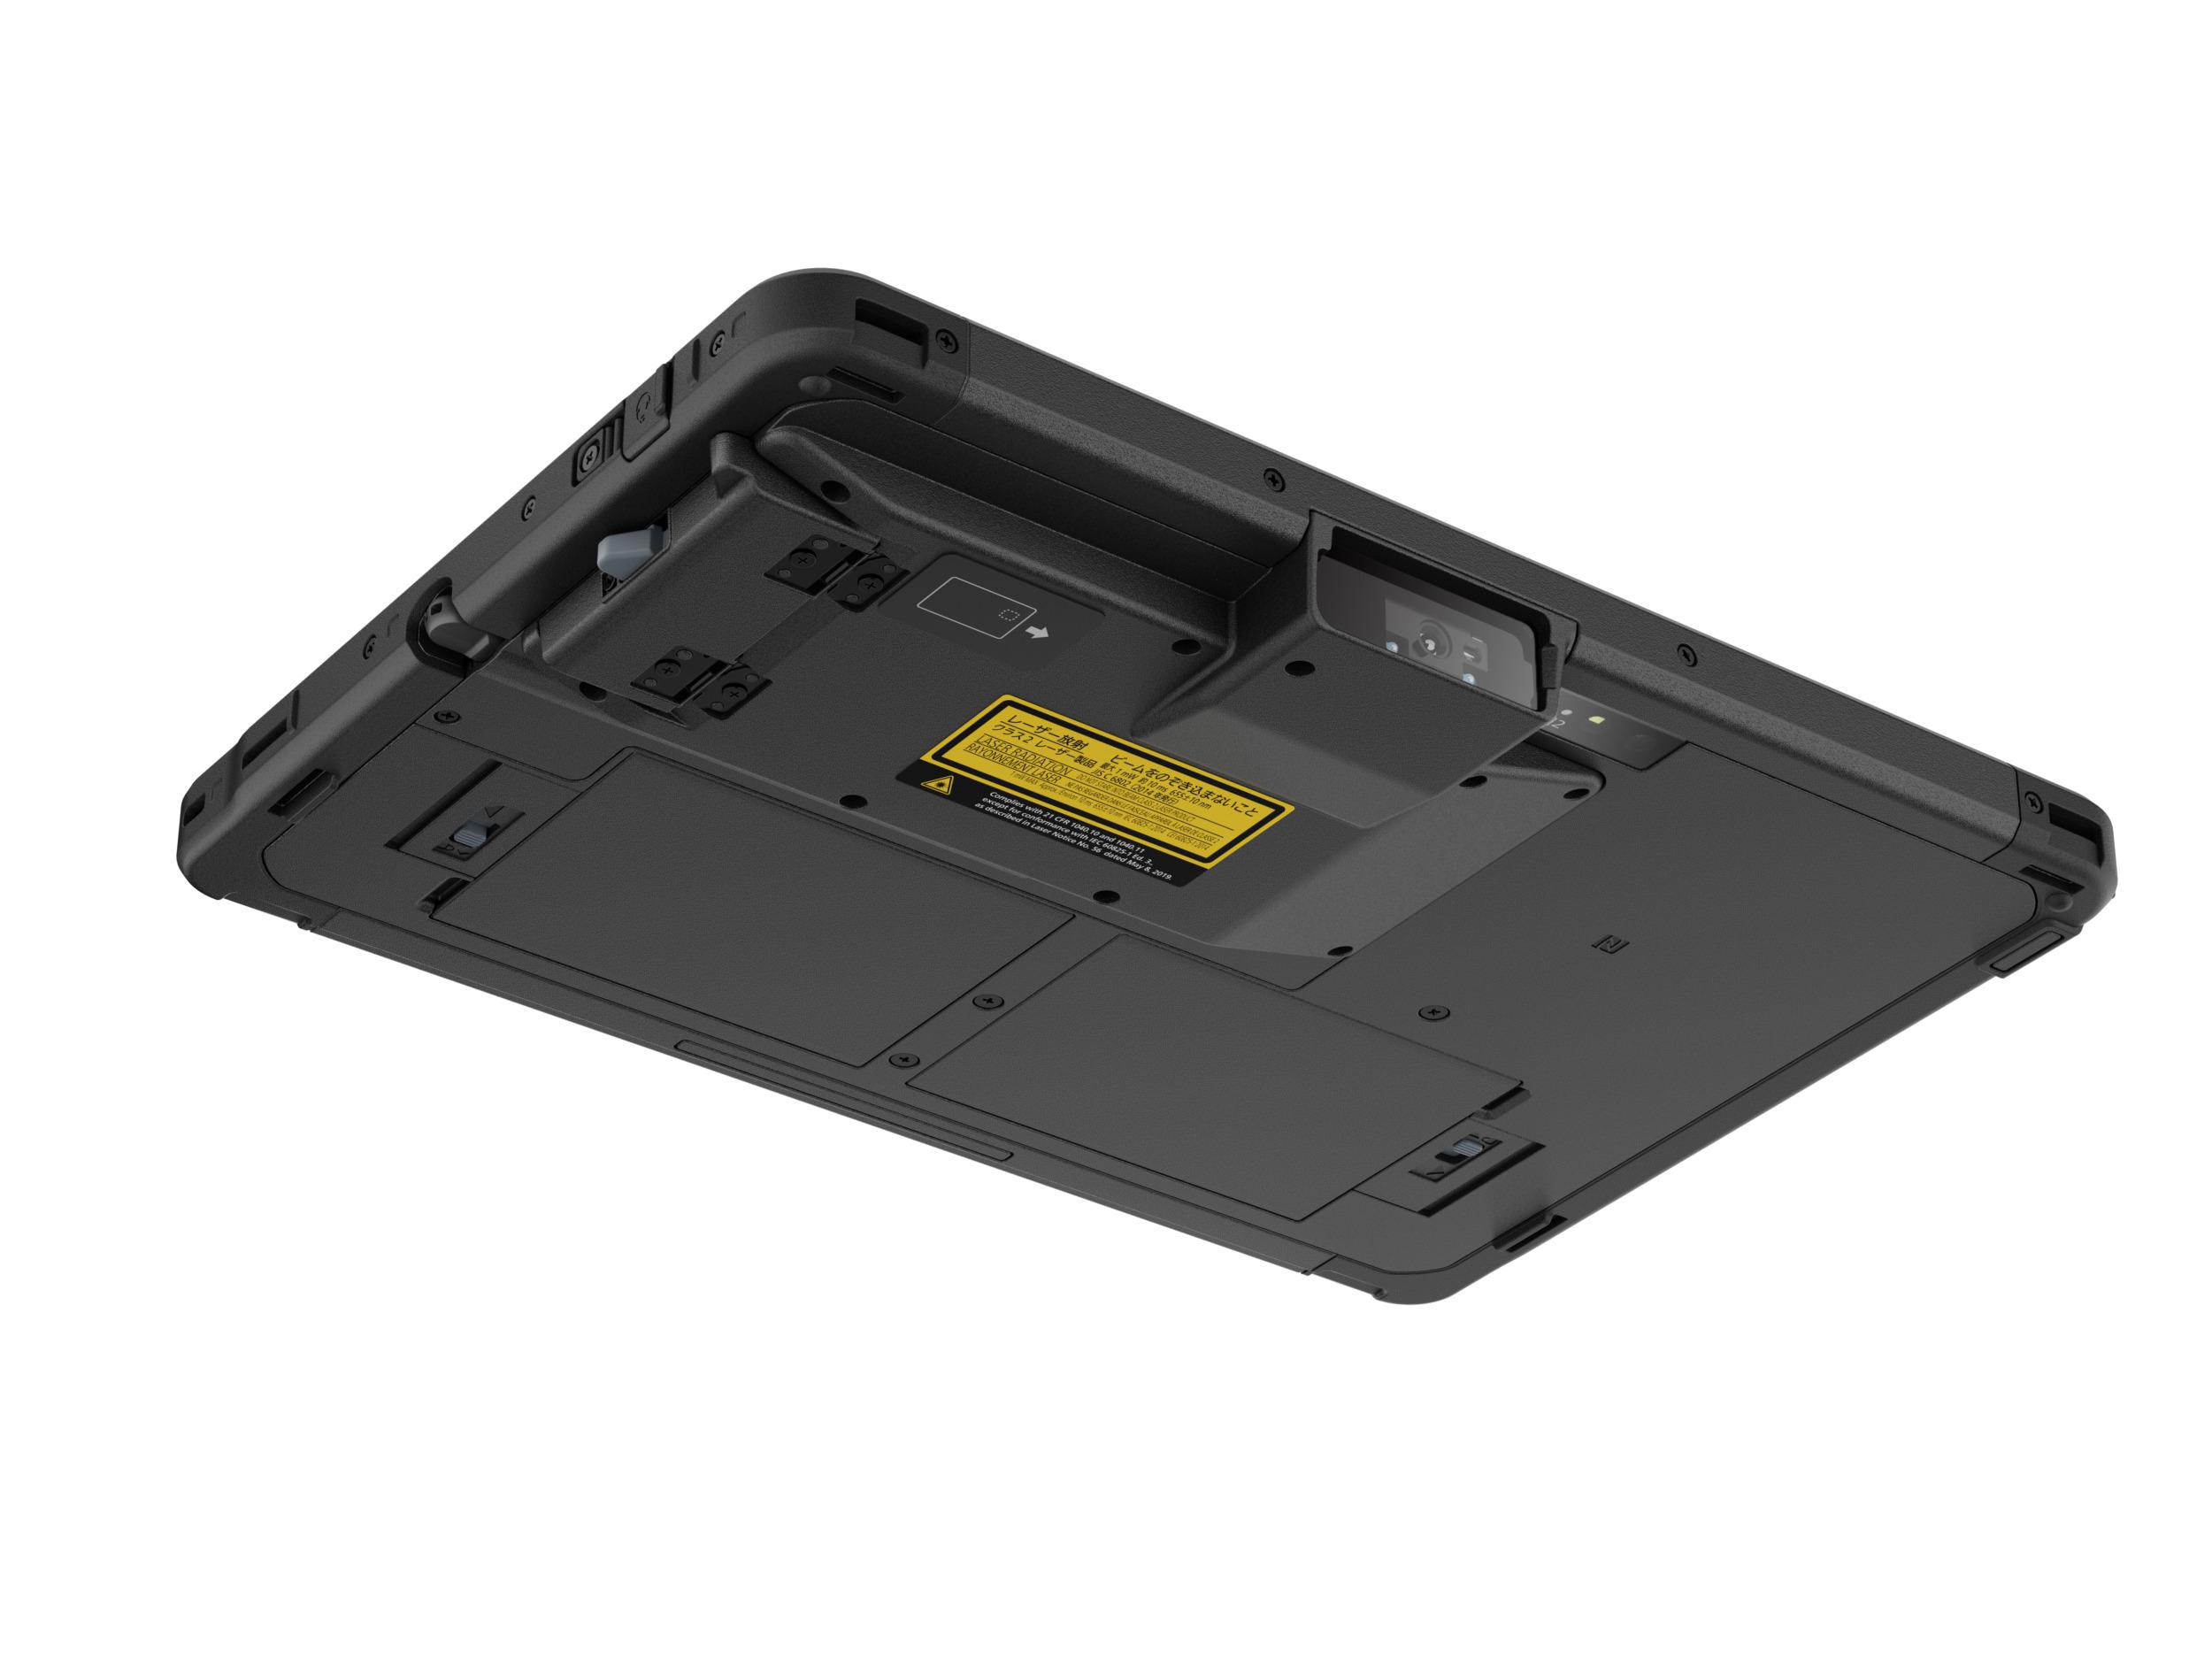 Panasonic Toughbook A3 3 6000x4500x